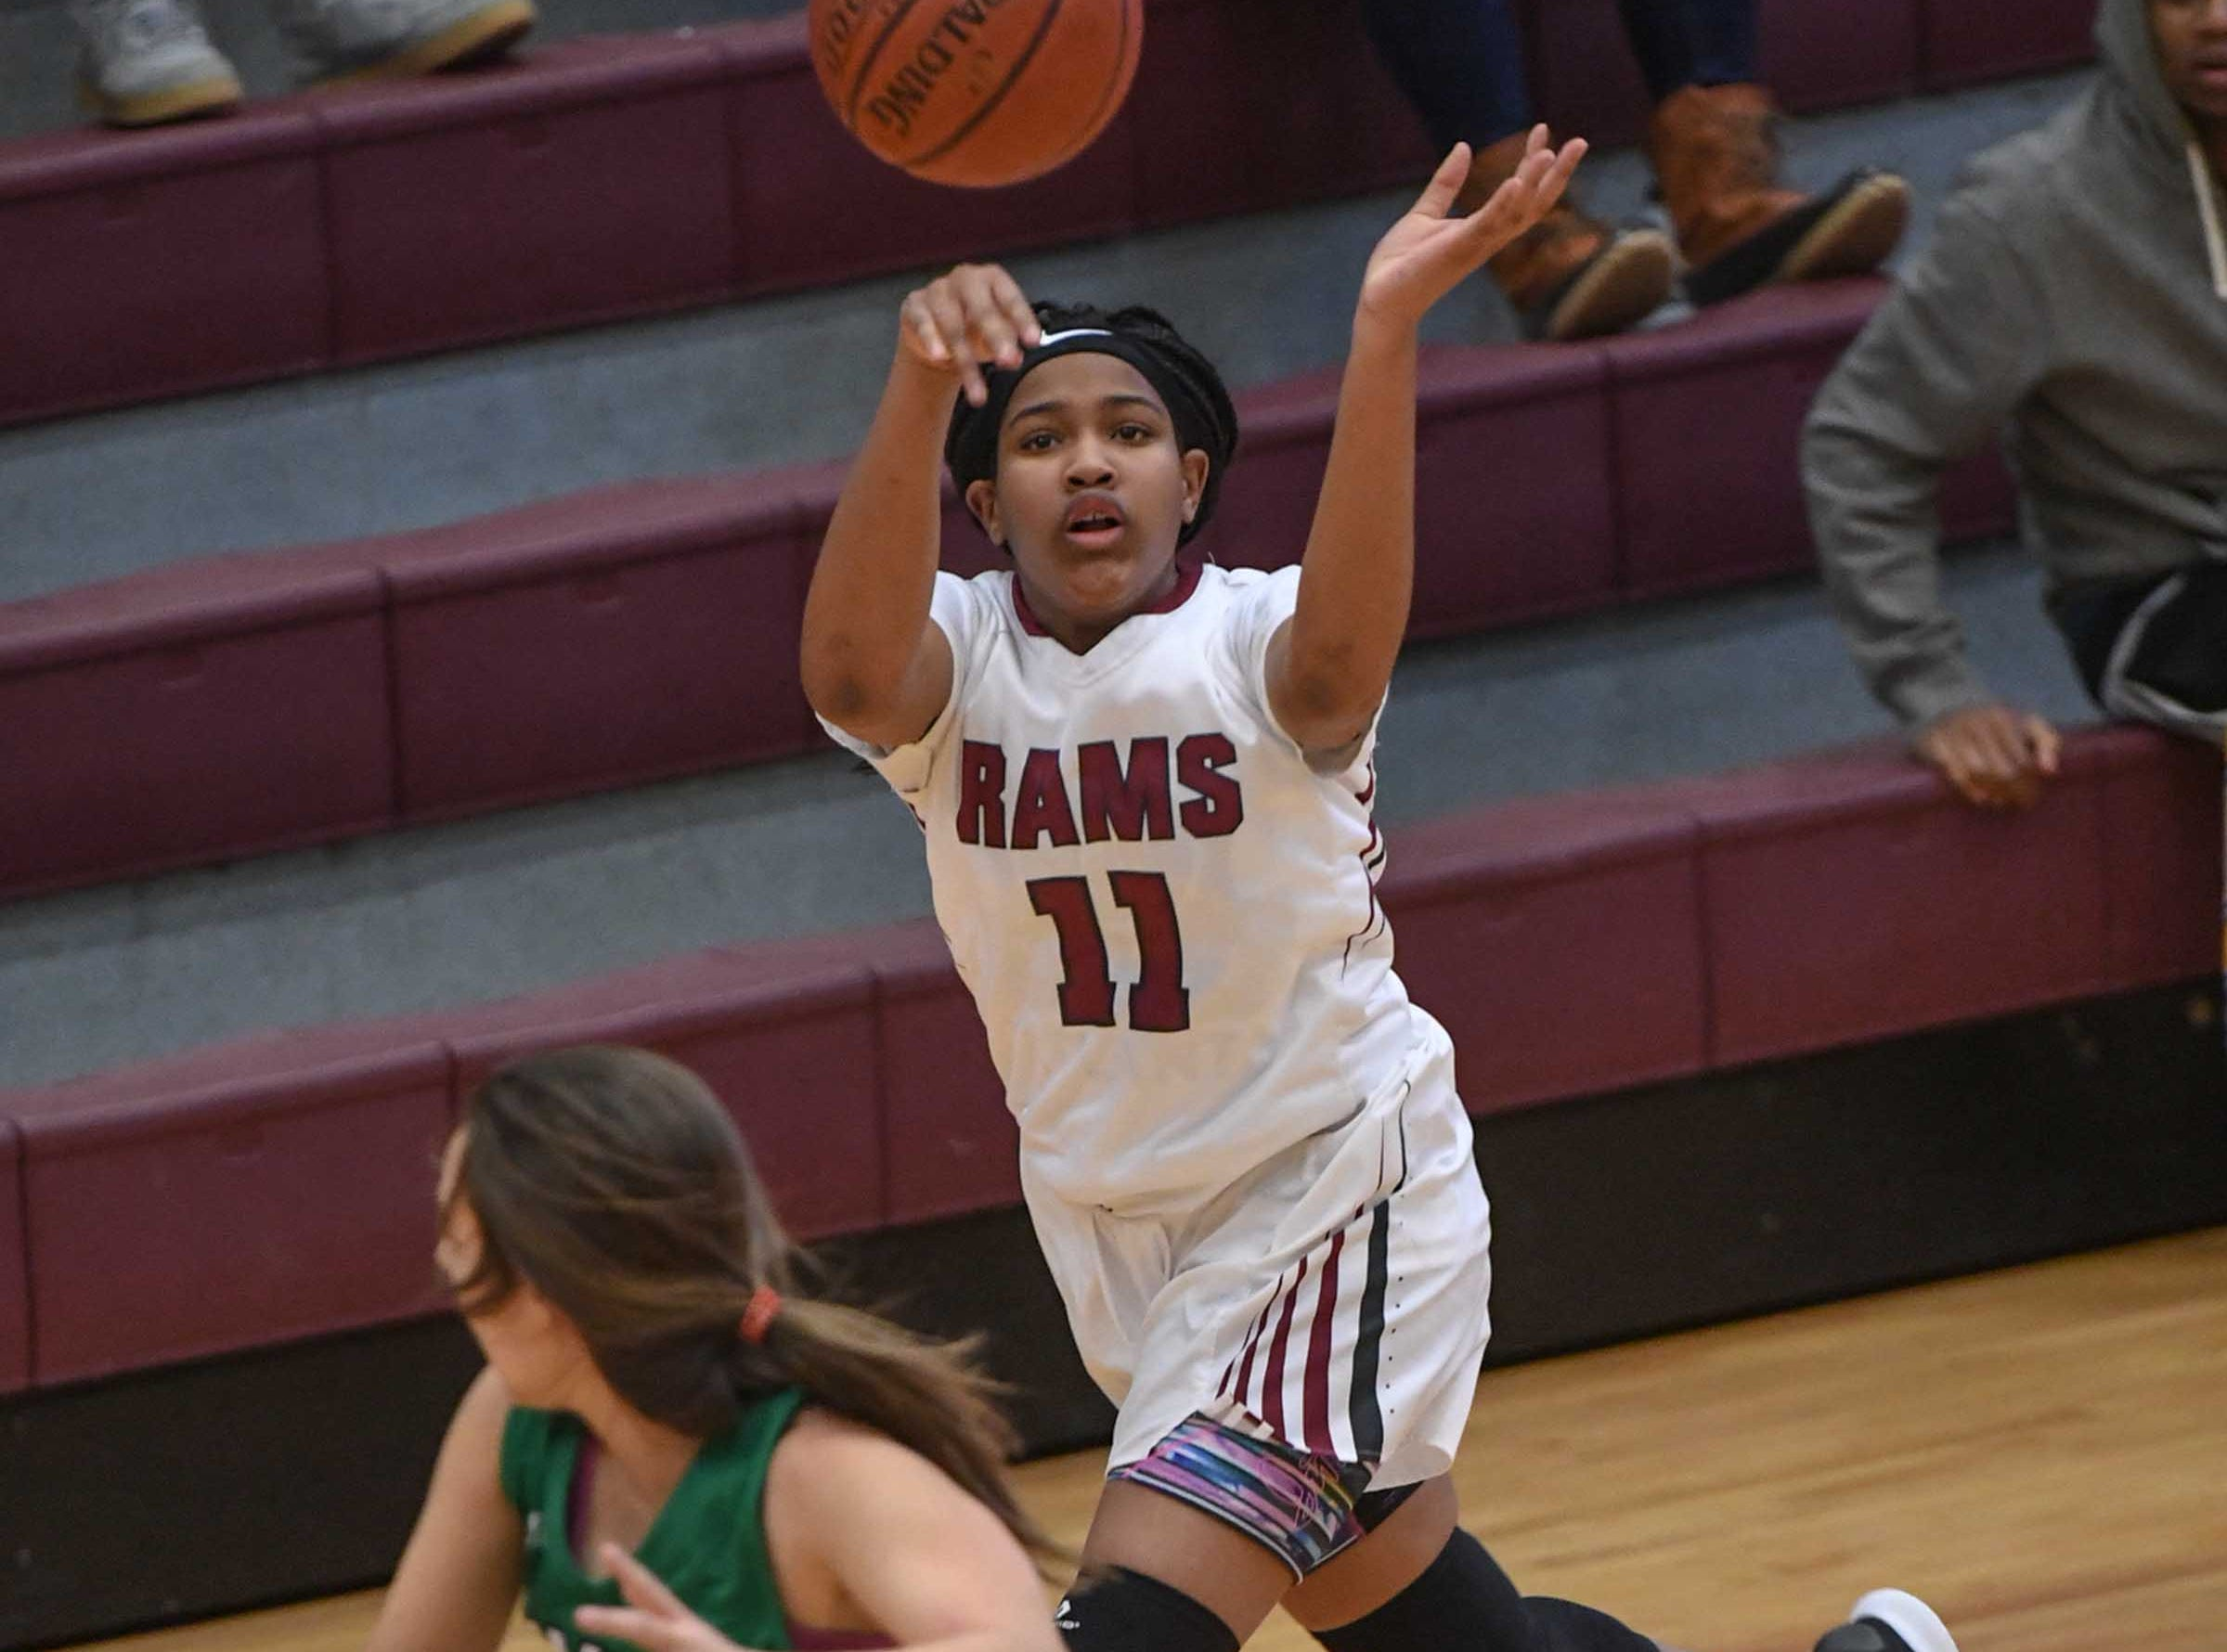 Westside freshman Destiny Middleton(11) passes near Easley sophomore Kaitlin Fuller(11) during the third quarter at Westside High School in Anderson on Friday.